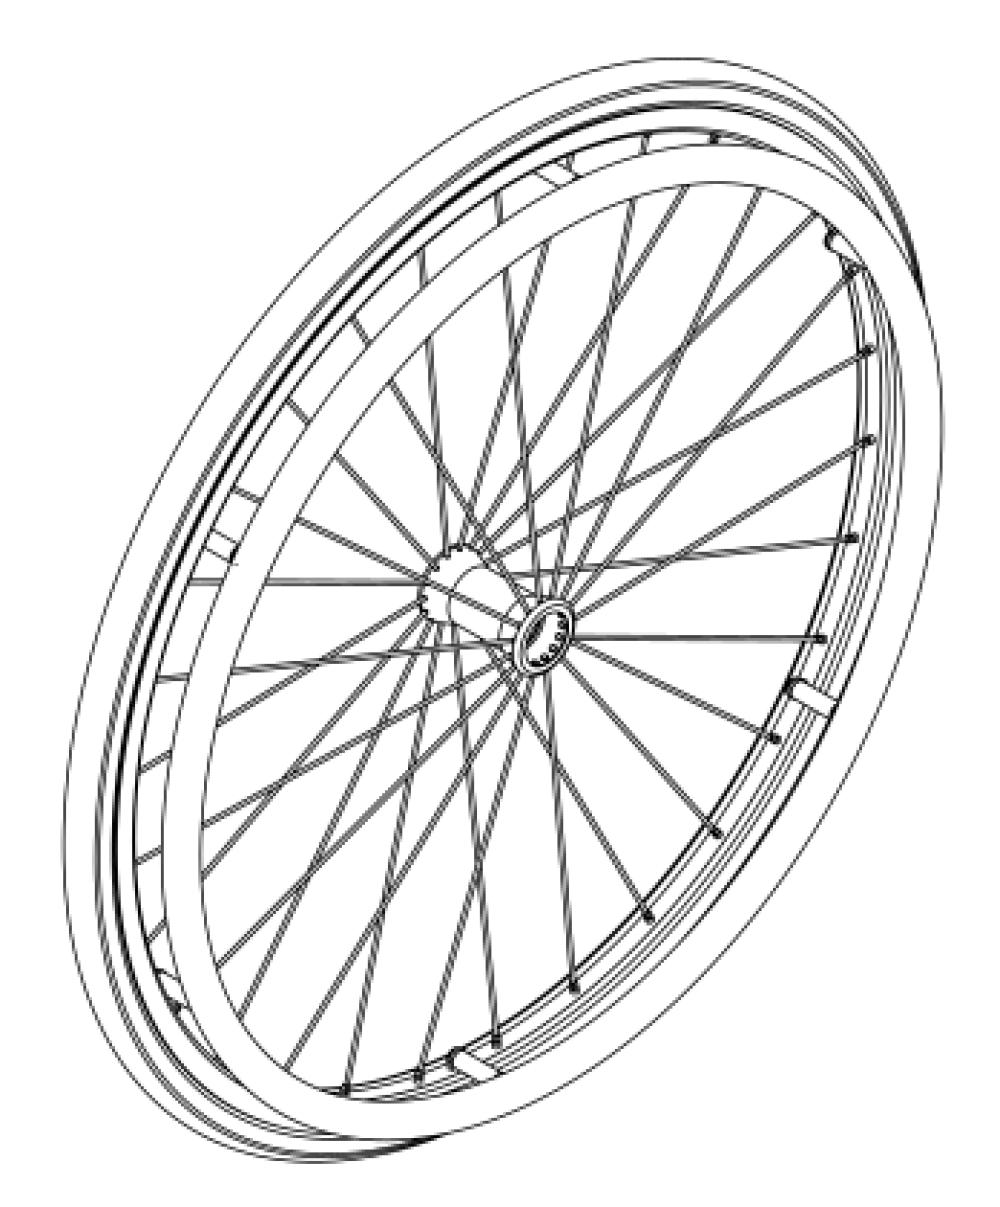 (discontinued) Rogue Xp Spoke Wheel / Tire / Handrim Kits parts diagram